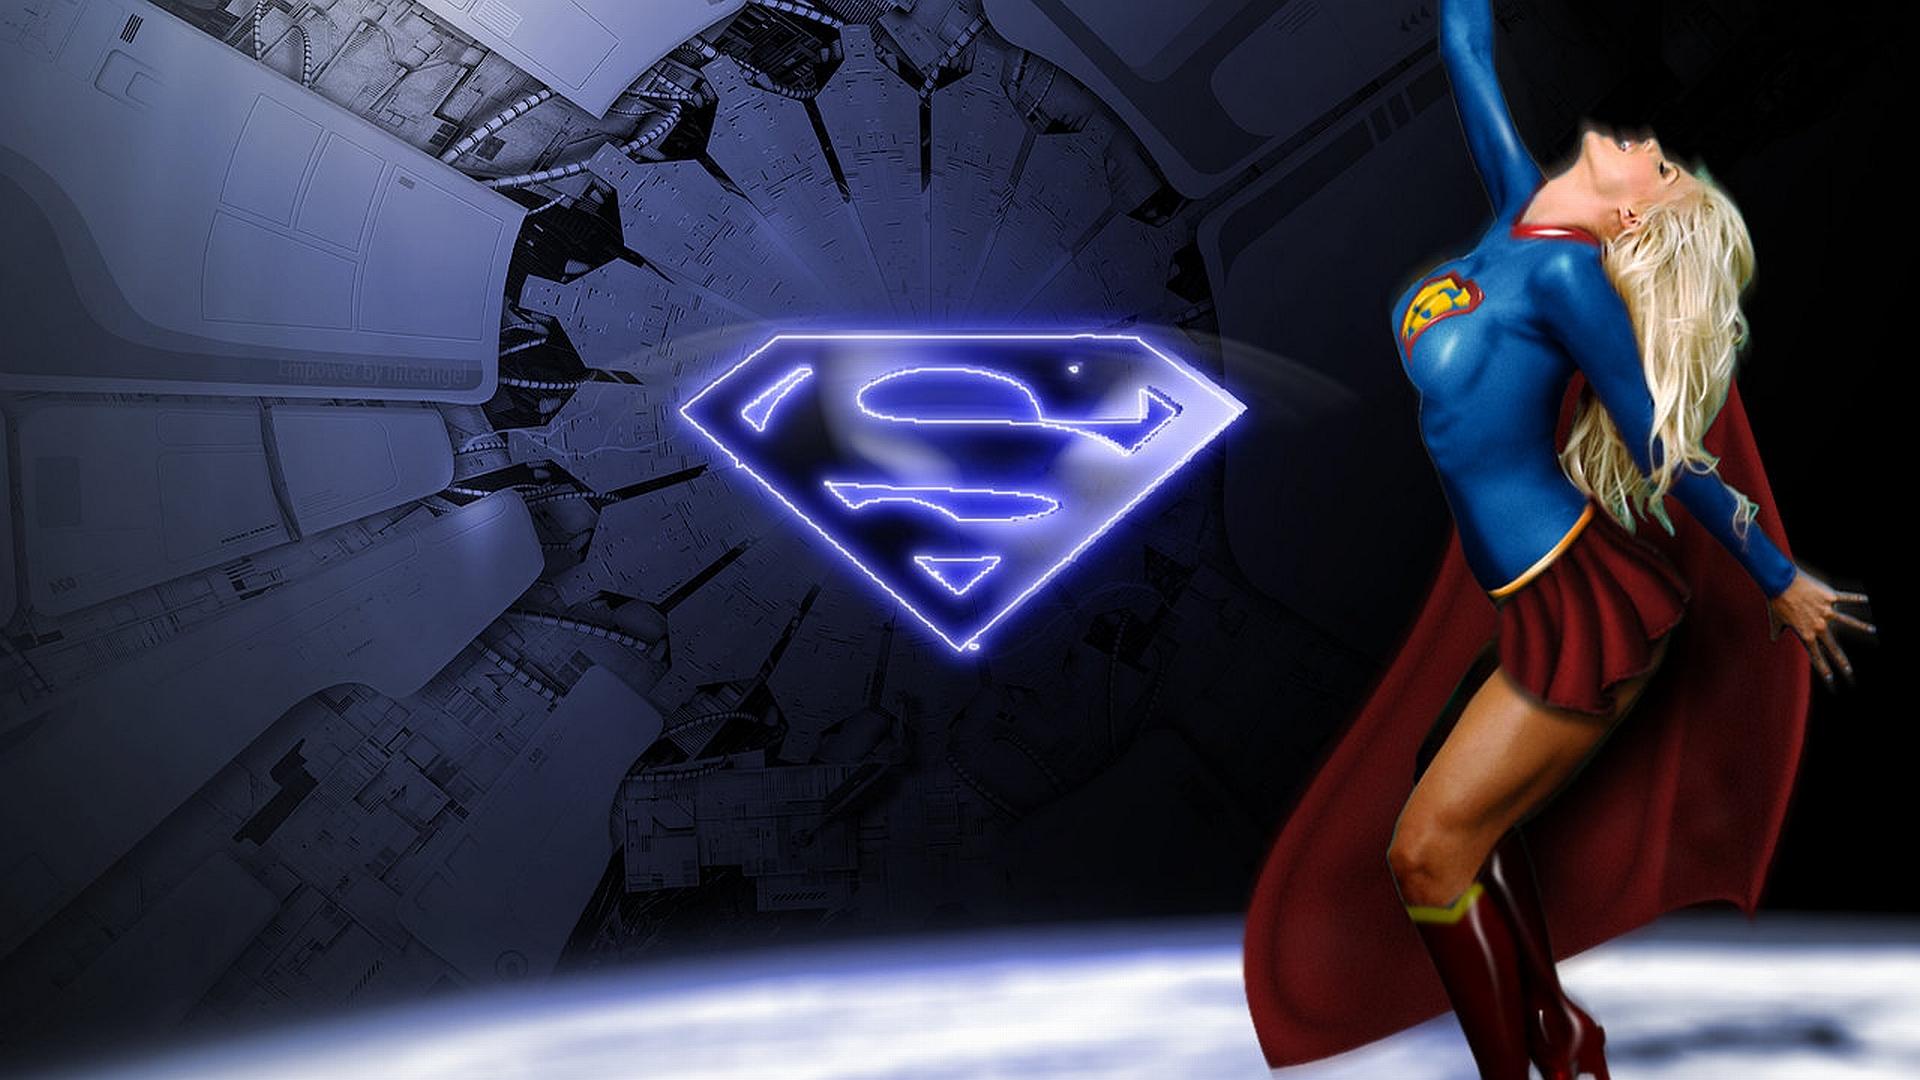 Supergirl with superman logo pchdwallpaper supergirl with superman logo pchdwallpaper pchdwallpaper voltagebd Gallery